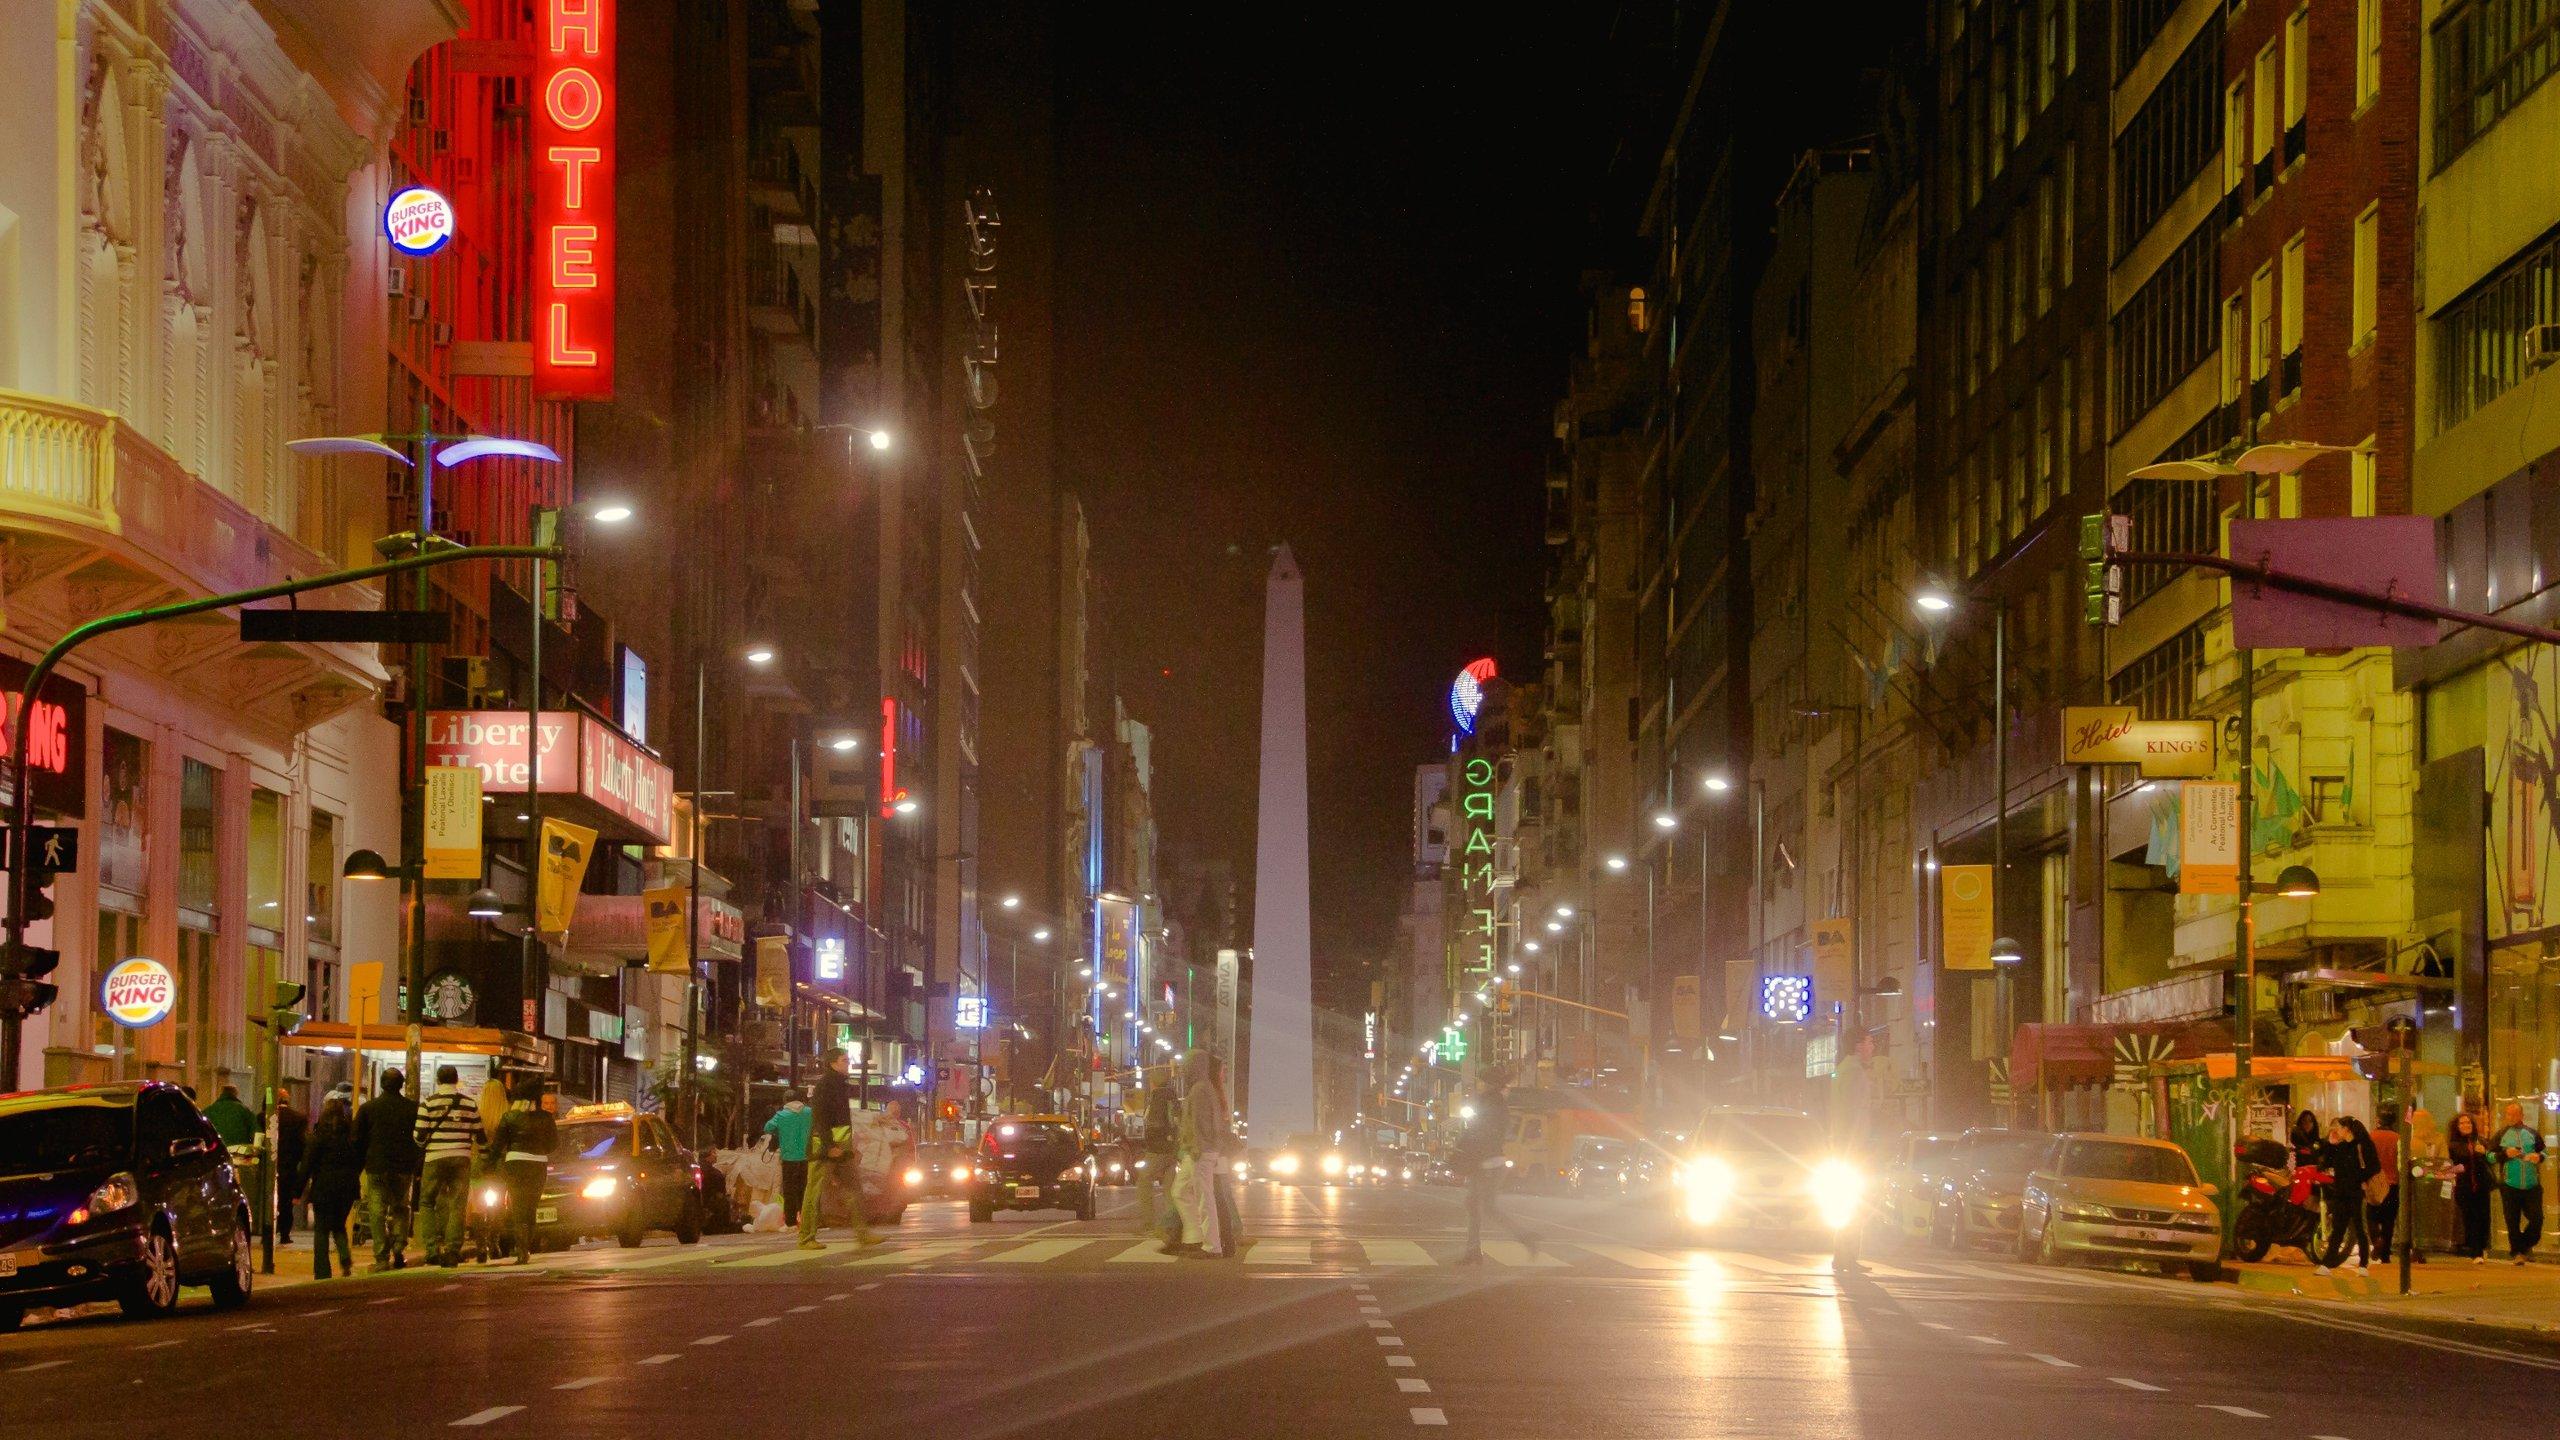 Avenida Corrientes, Buenos Aires, Argentinien